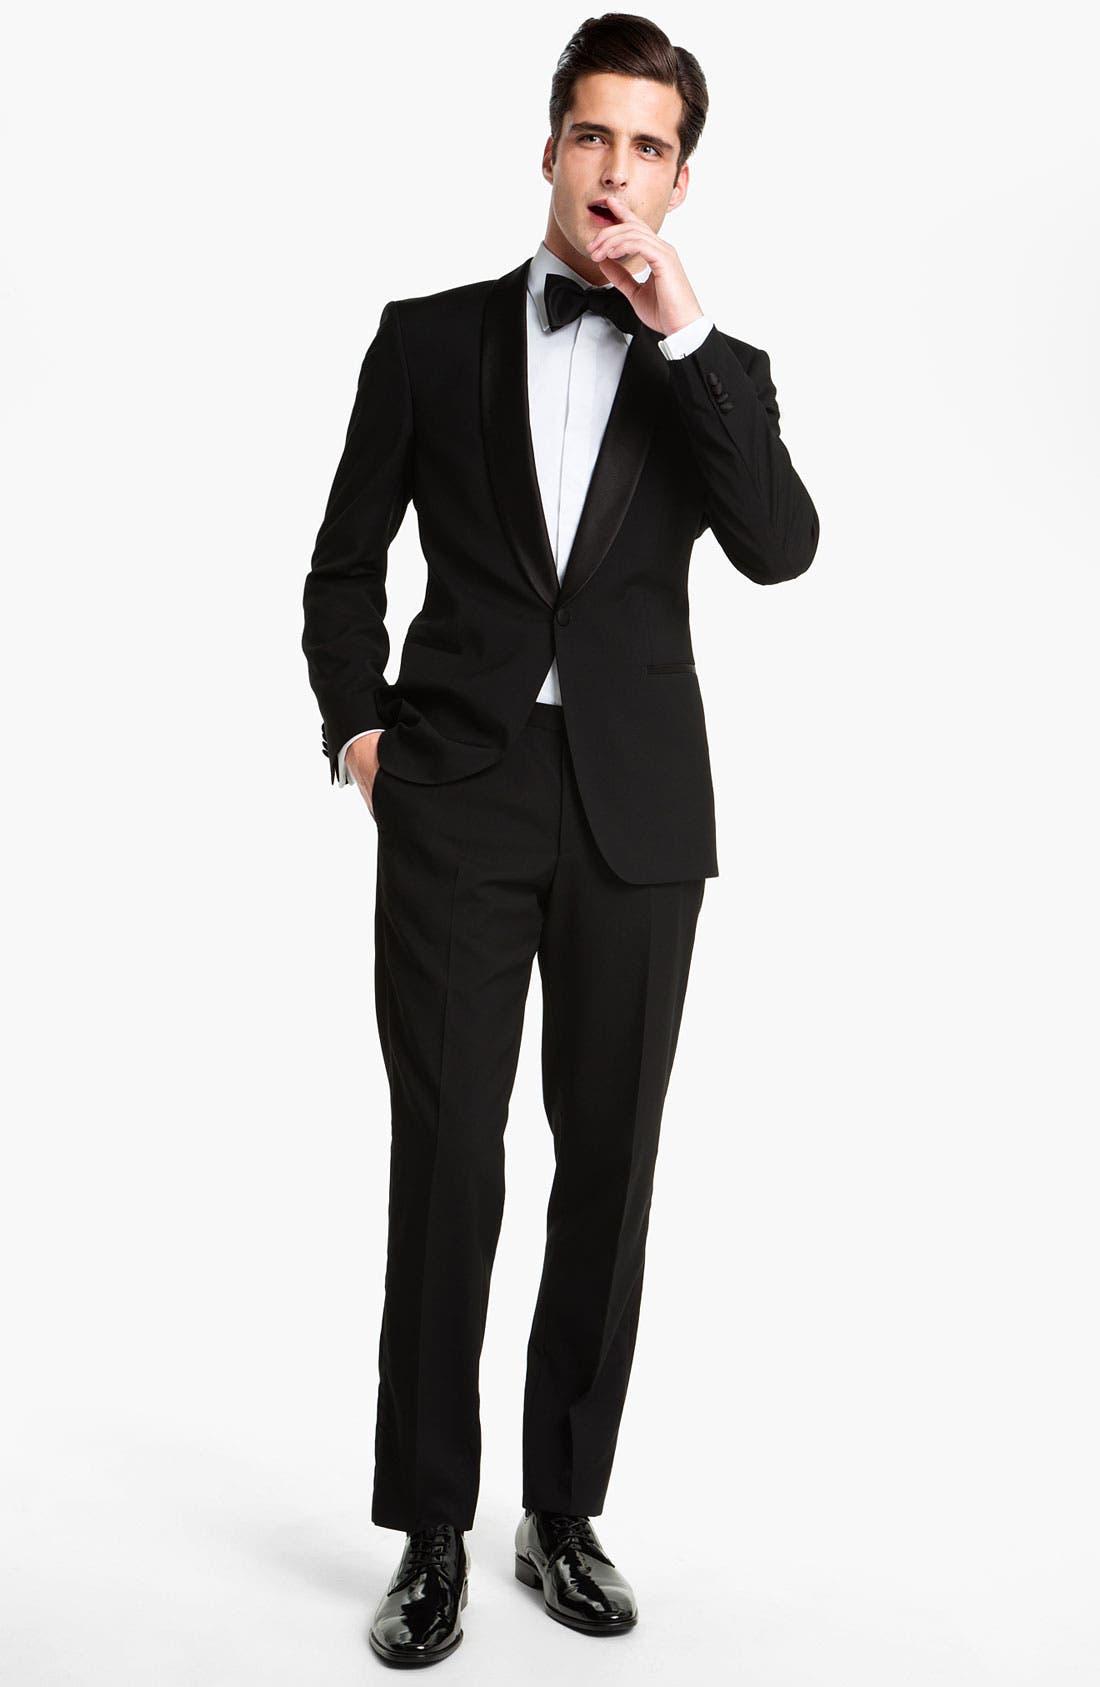 boss \u0027sky gala\u0027 shawl lapel tuxedo1418460 Hugo Boss Tuxedo Shirt Nordstrom #12